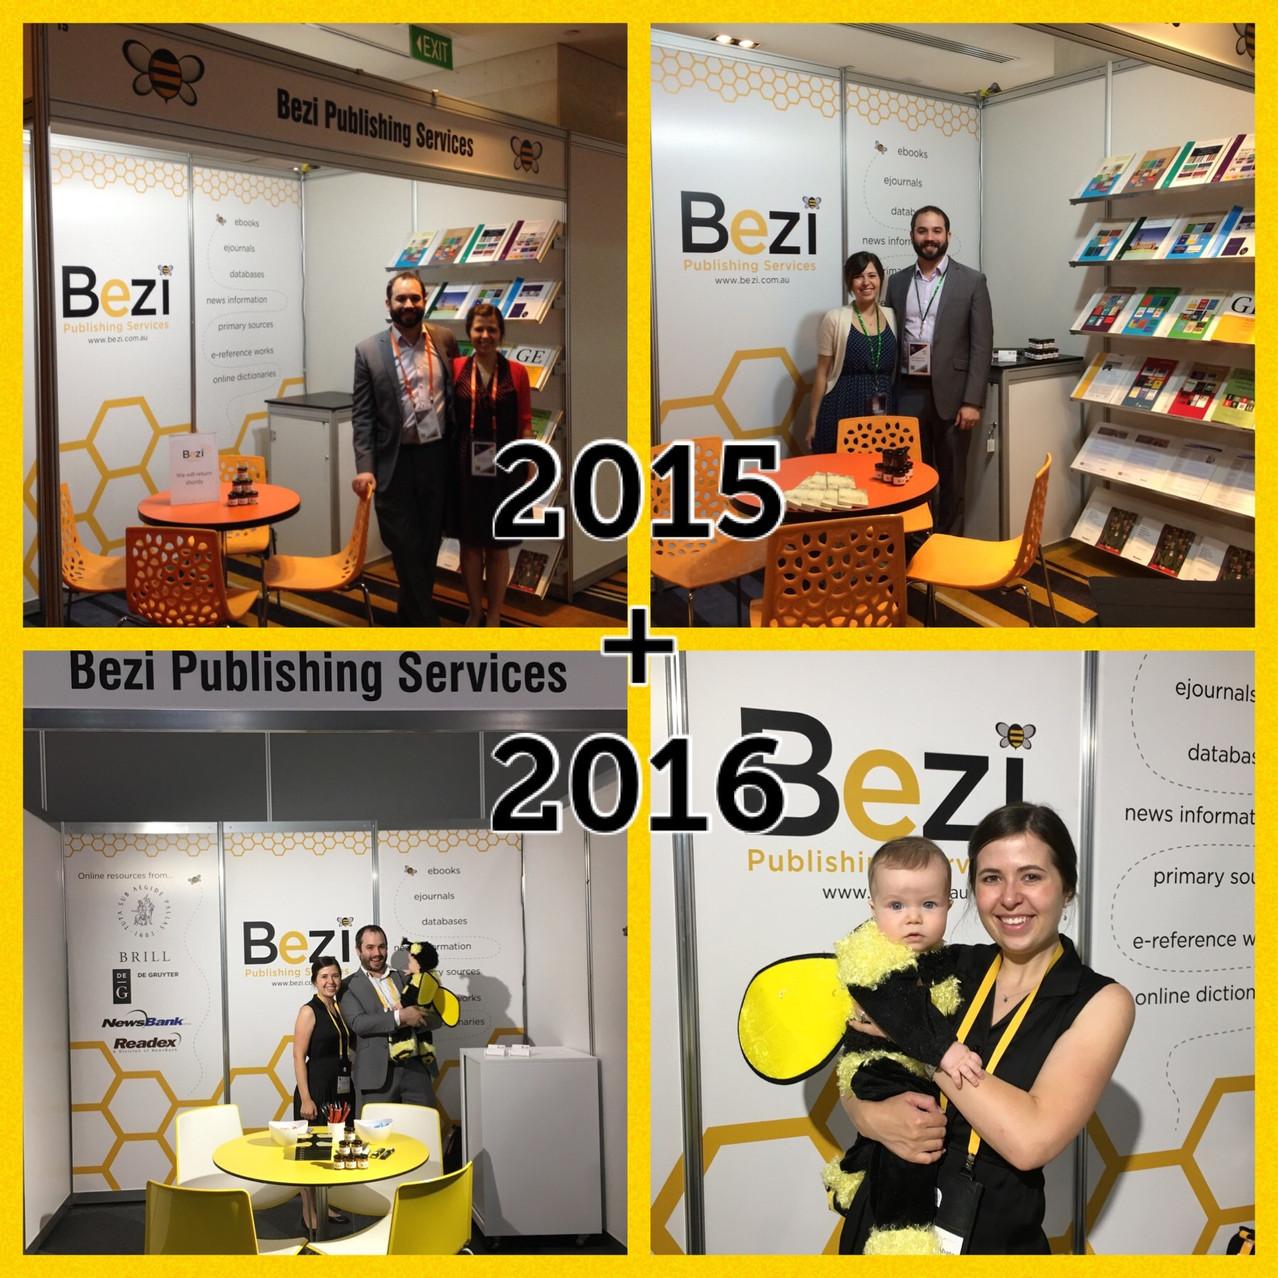 Scenes from ALIA Online 2015 + VALA 2016